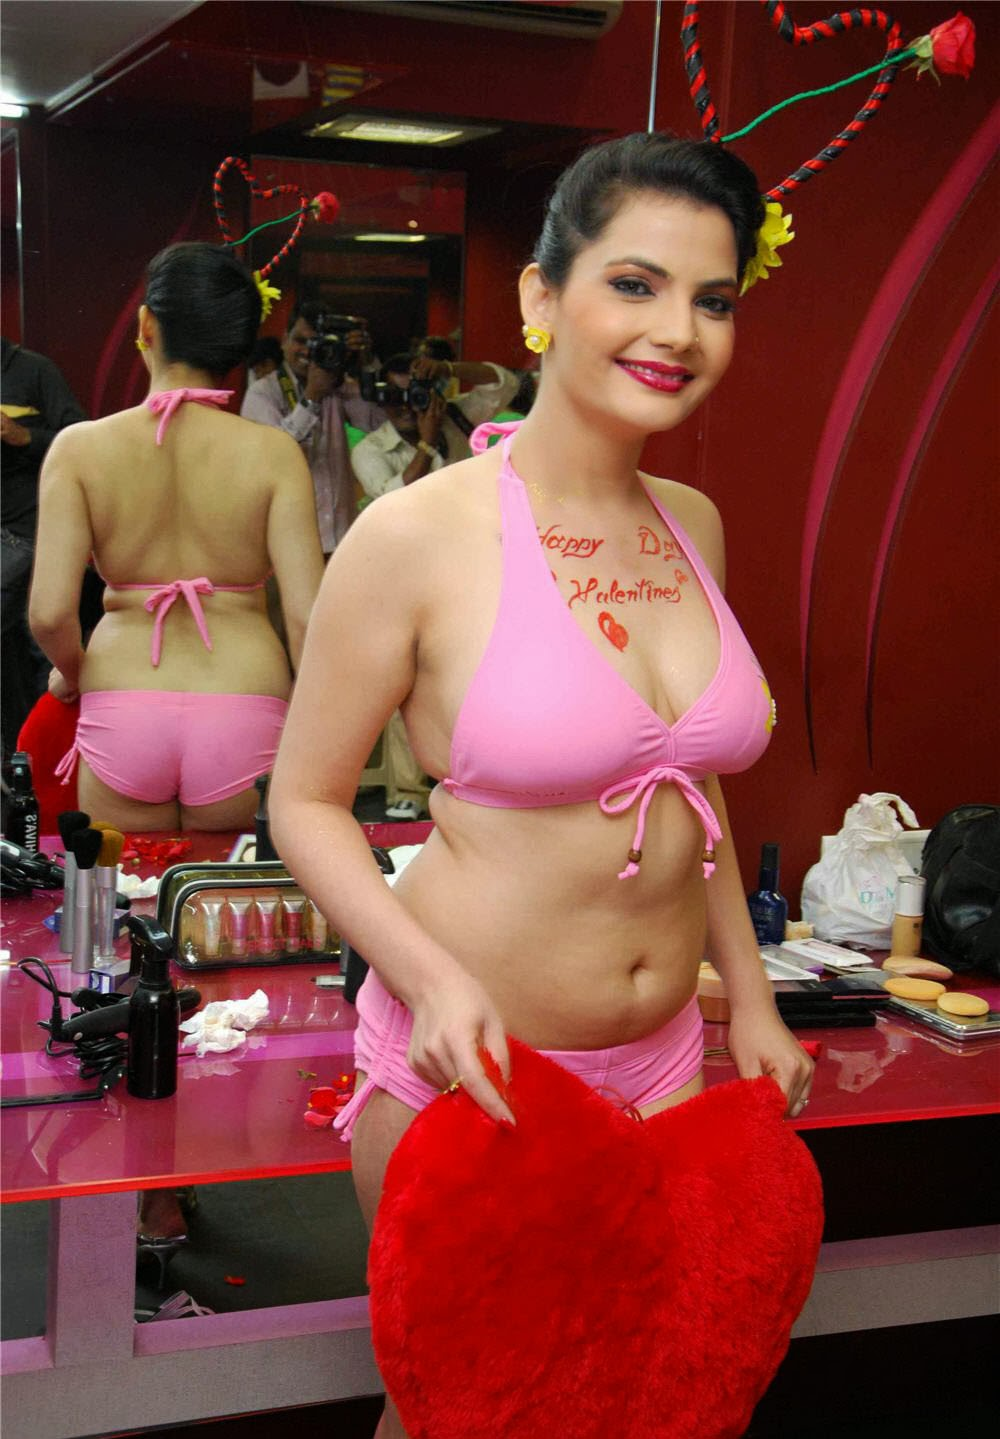 21 OOPS Madhavi Sharma Hot Sexy Milky Thighs Bikini And Upskirt